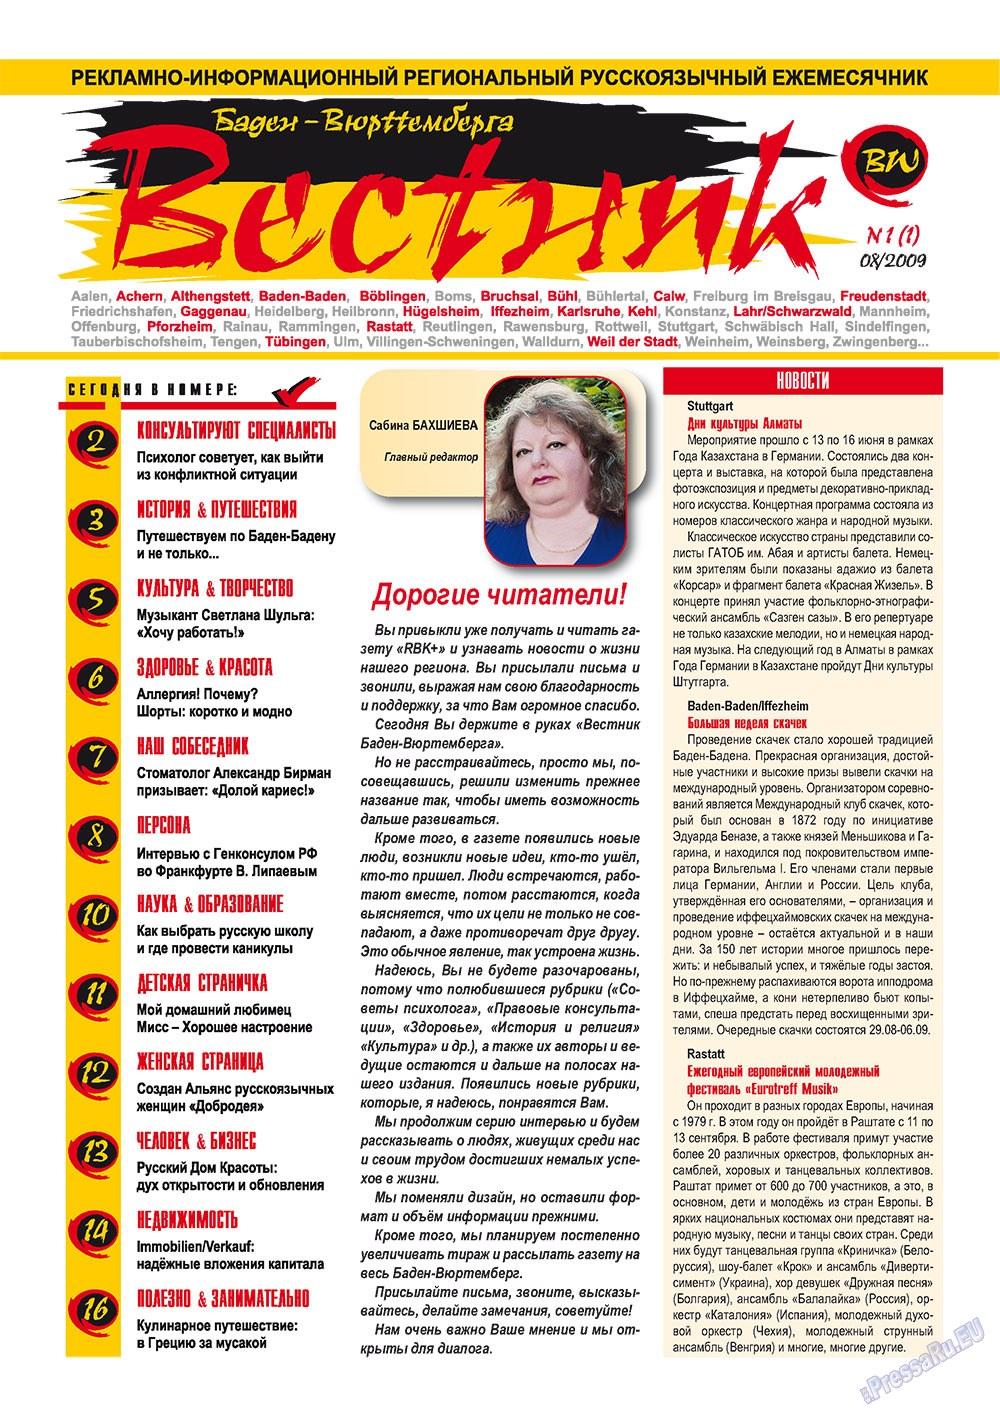 Вестник-info (журнал). 2009 год, номер 1, стр. 1